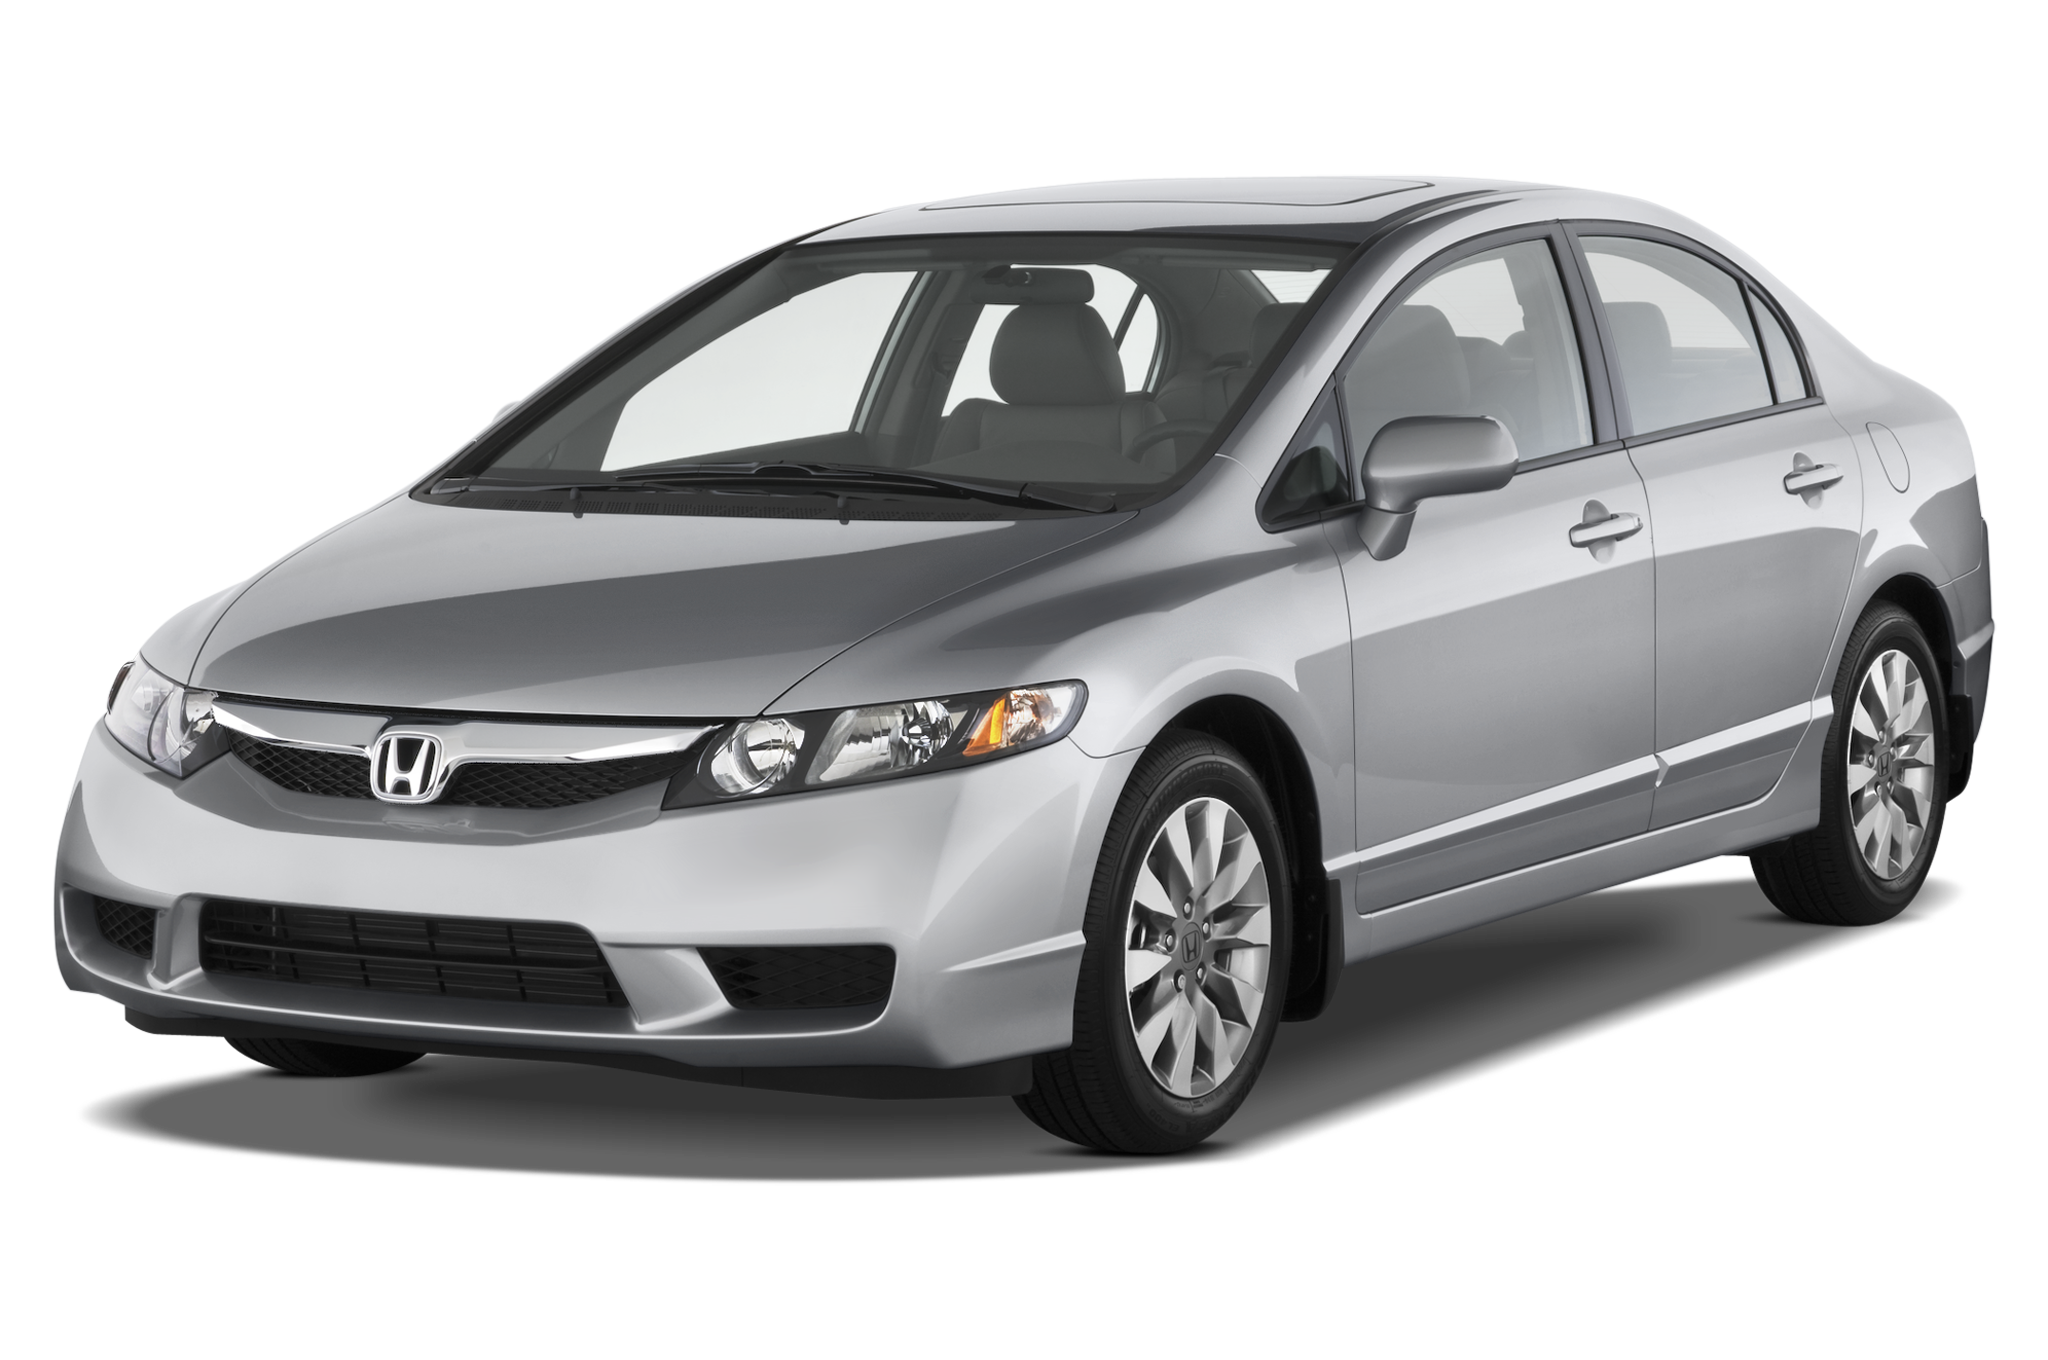 Superior 2011 Honda Civic SI Coupe. 21|246. 22|246